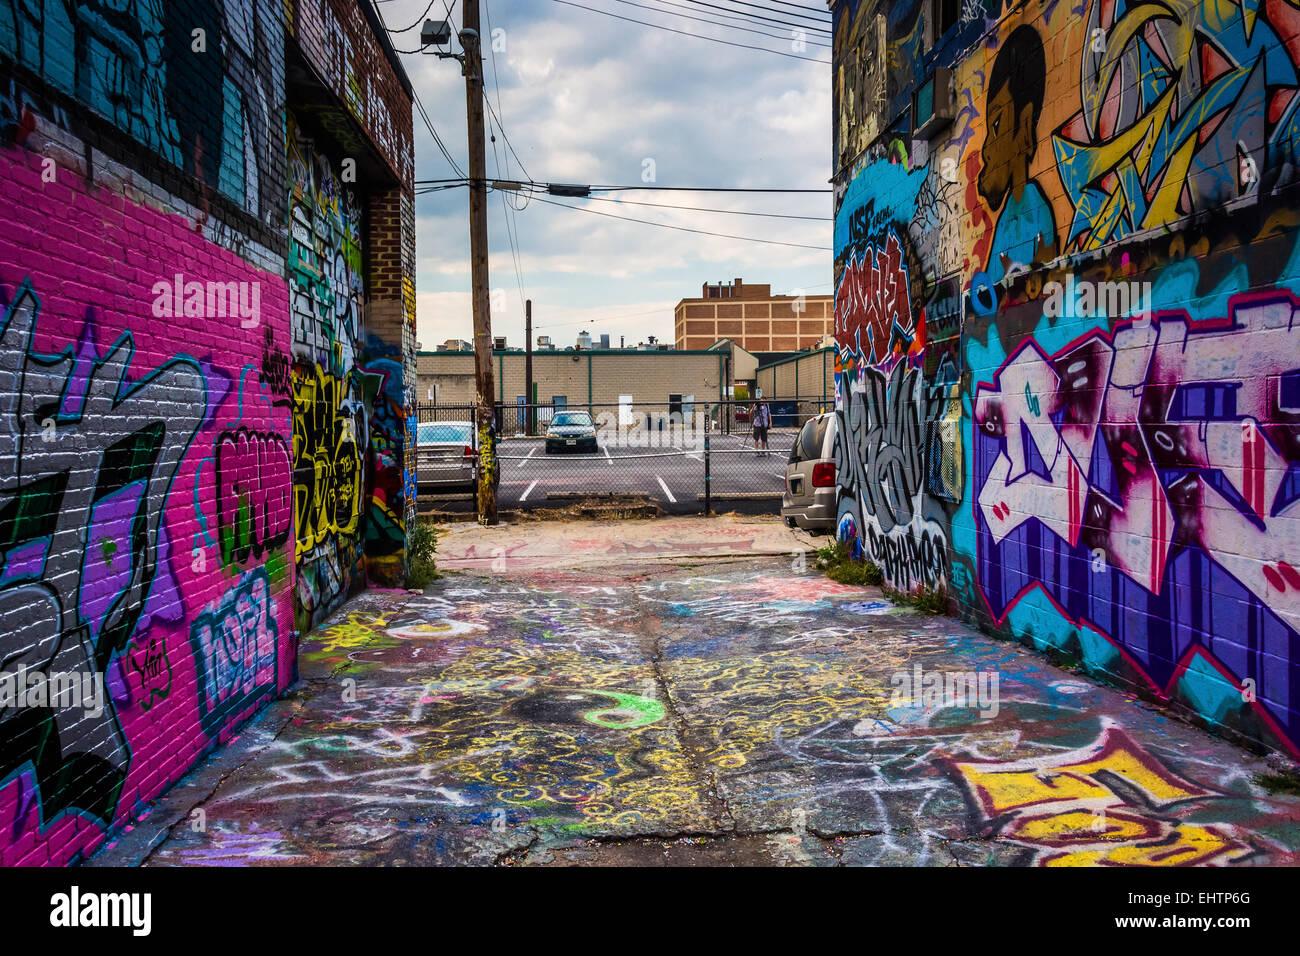 Graffiti wall baltimore - Incredible Artwork In Graffiti Alley Baltimore Maryland Stock Image